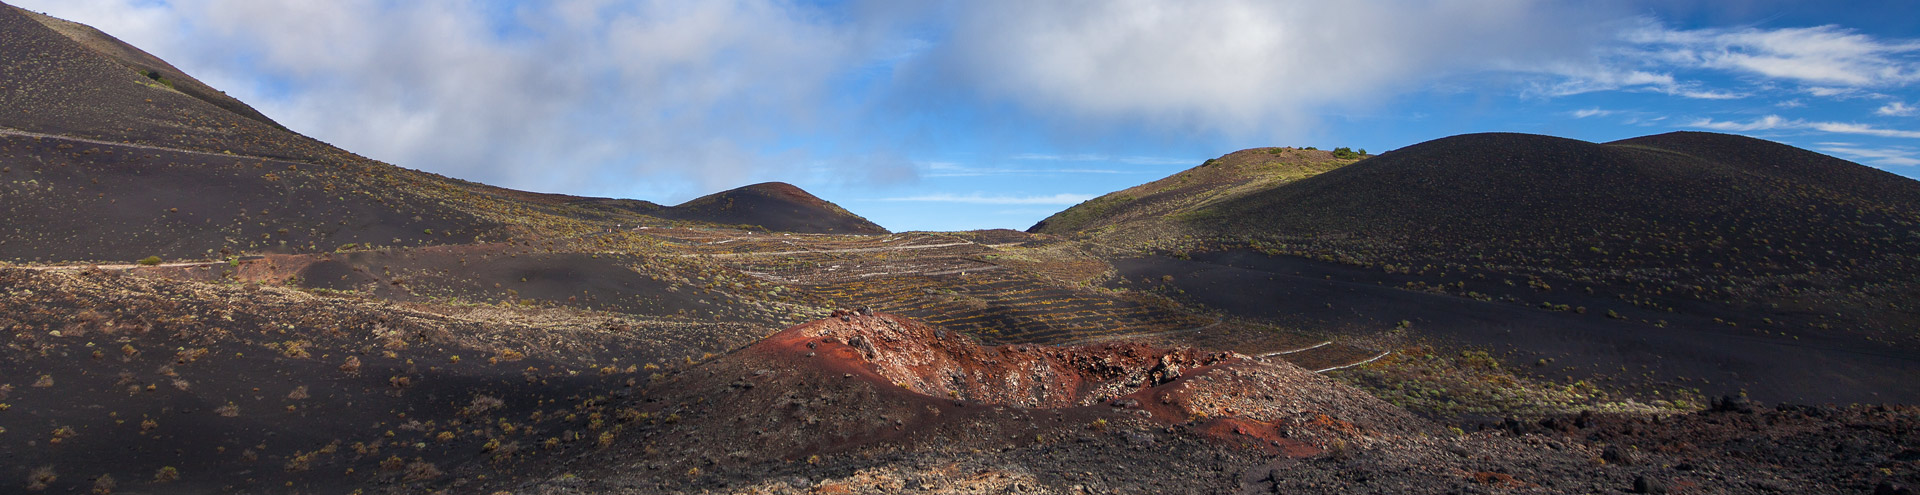 The volcano Teneguia on La Palma island